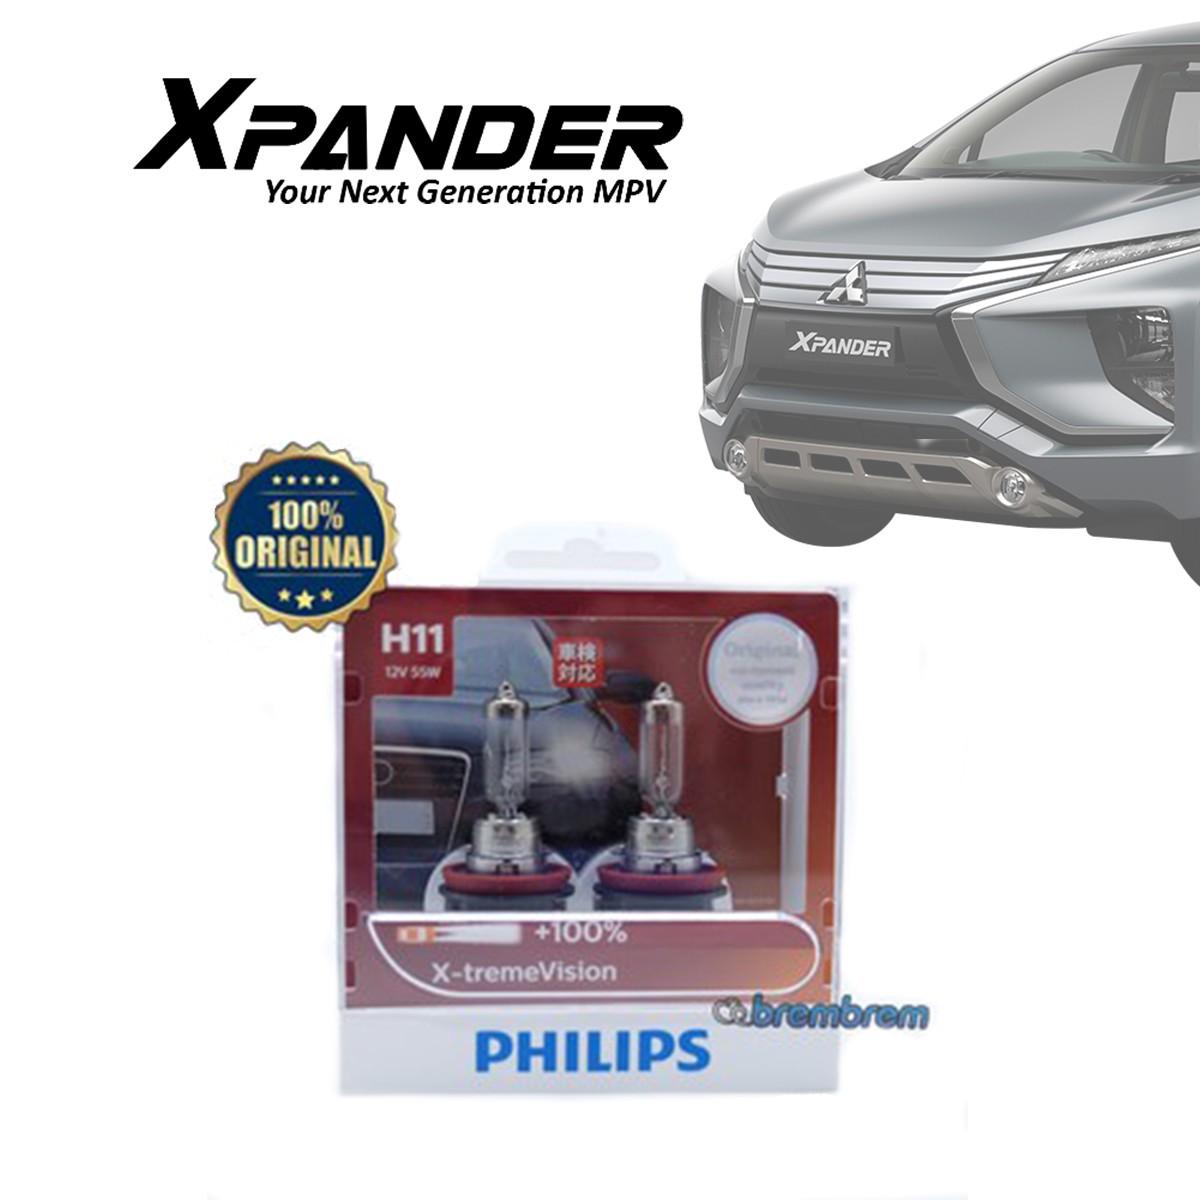 PHILIPS XTREME VISION H11 (3700K) - LAMPU HALOGEN MITSUBISHI XPANDER